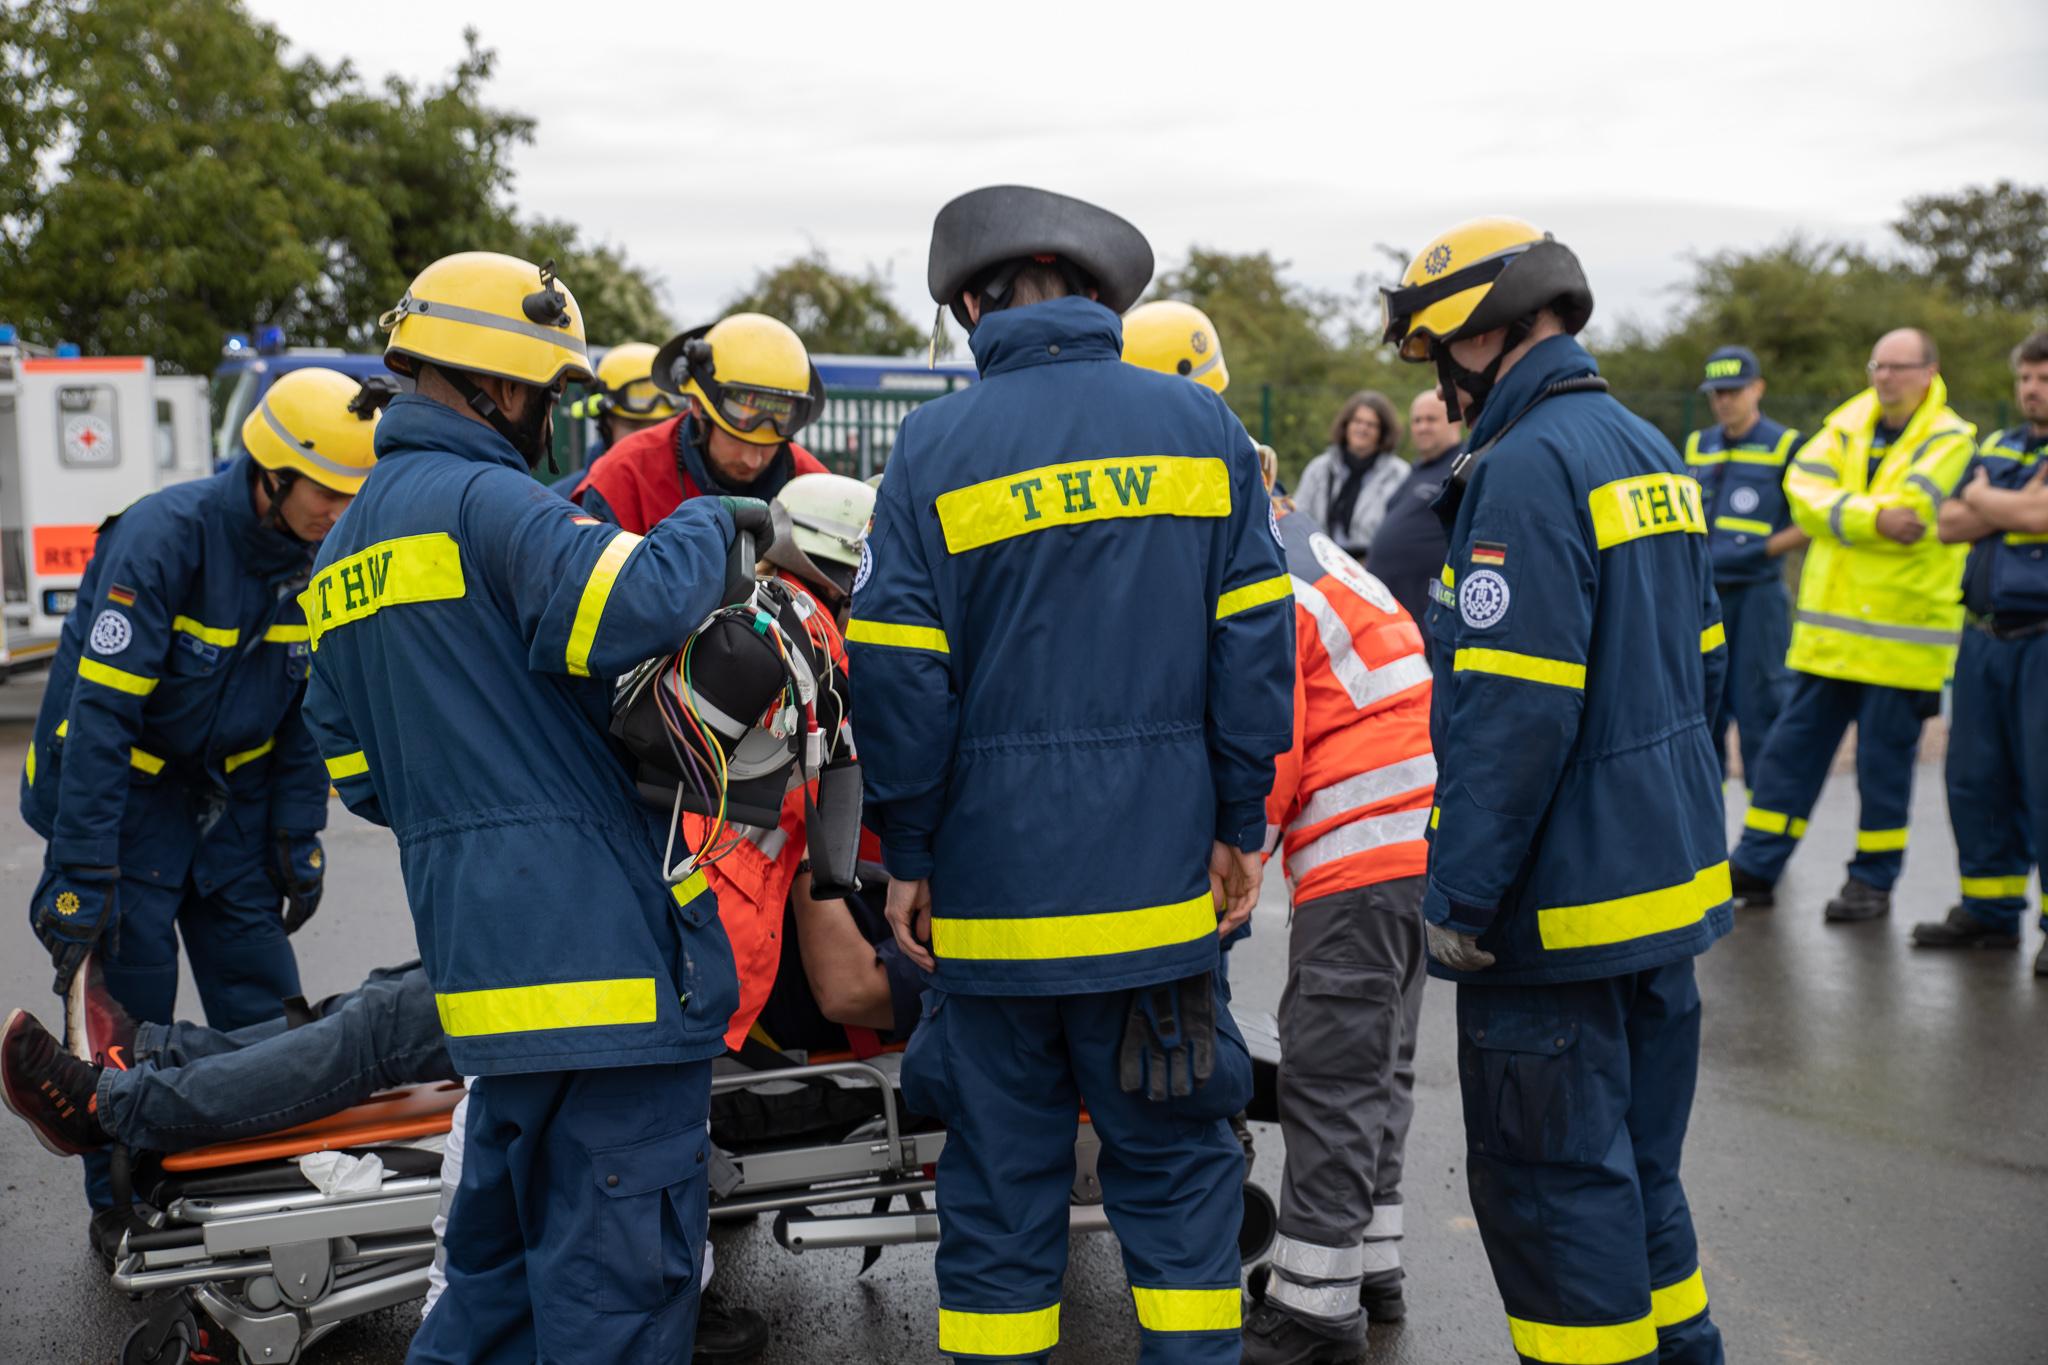 FeuerwehrSim 2019 Henckackerweg-41